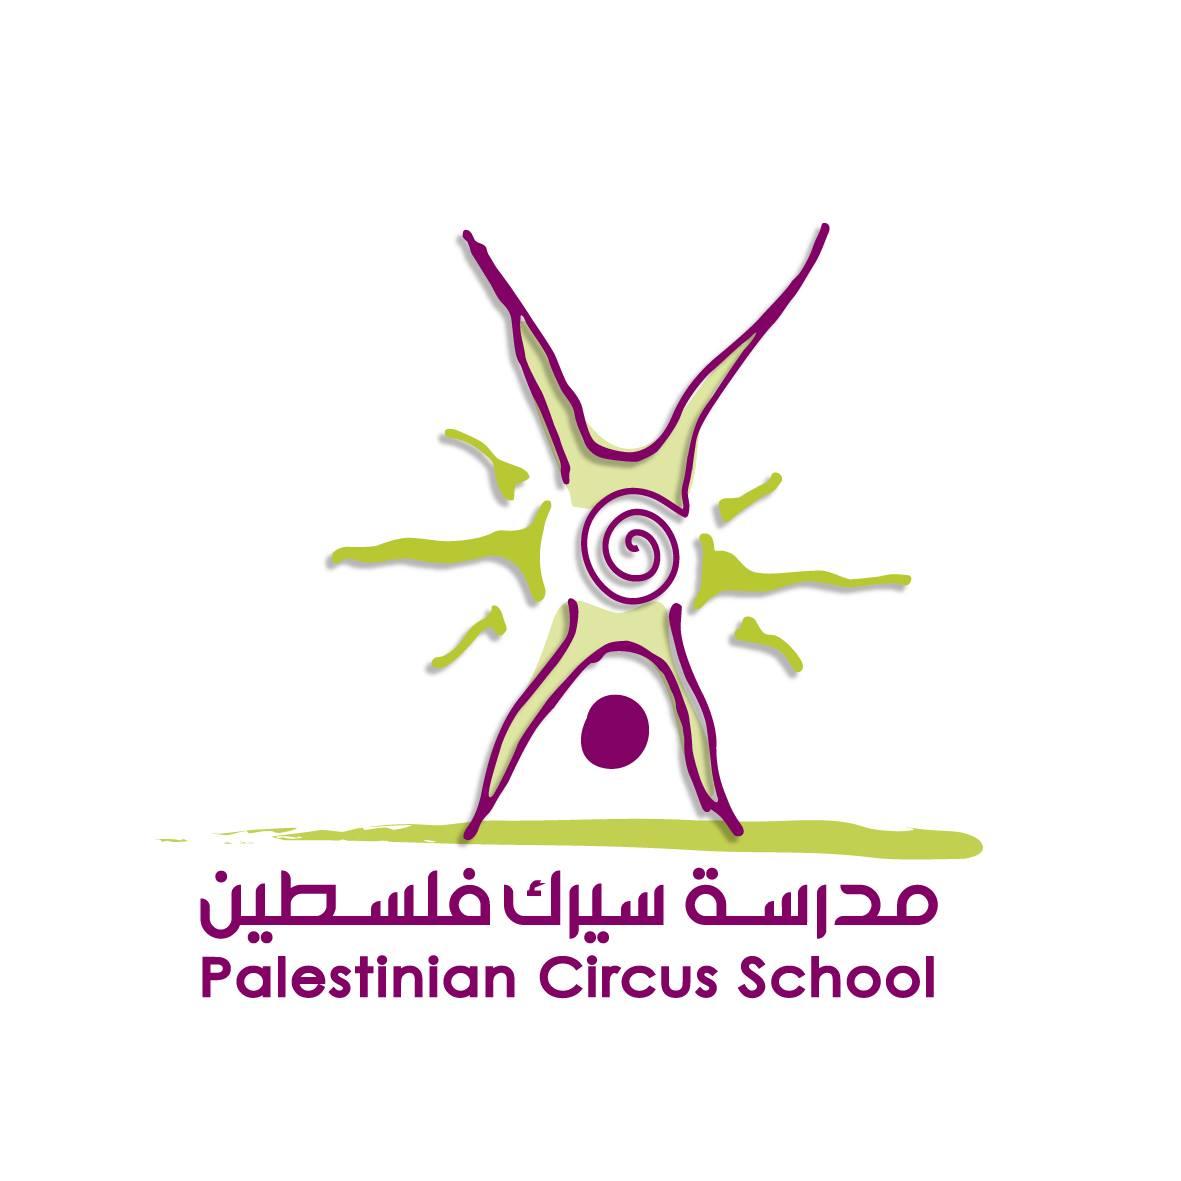 Palestinian Circus School logo